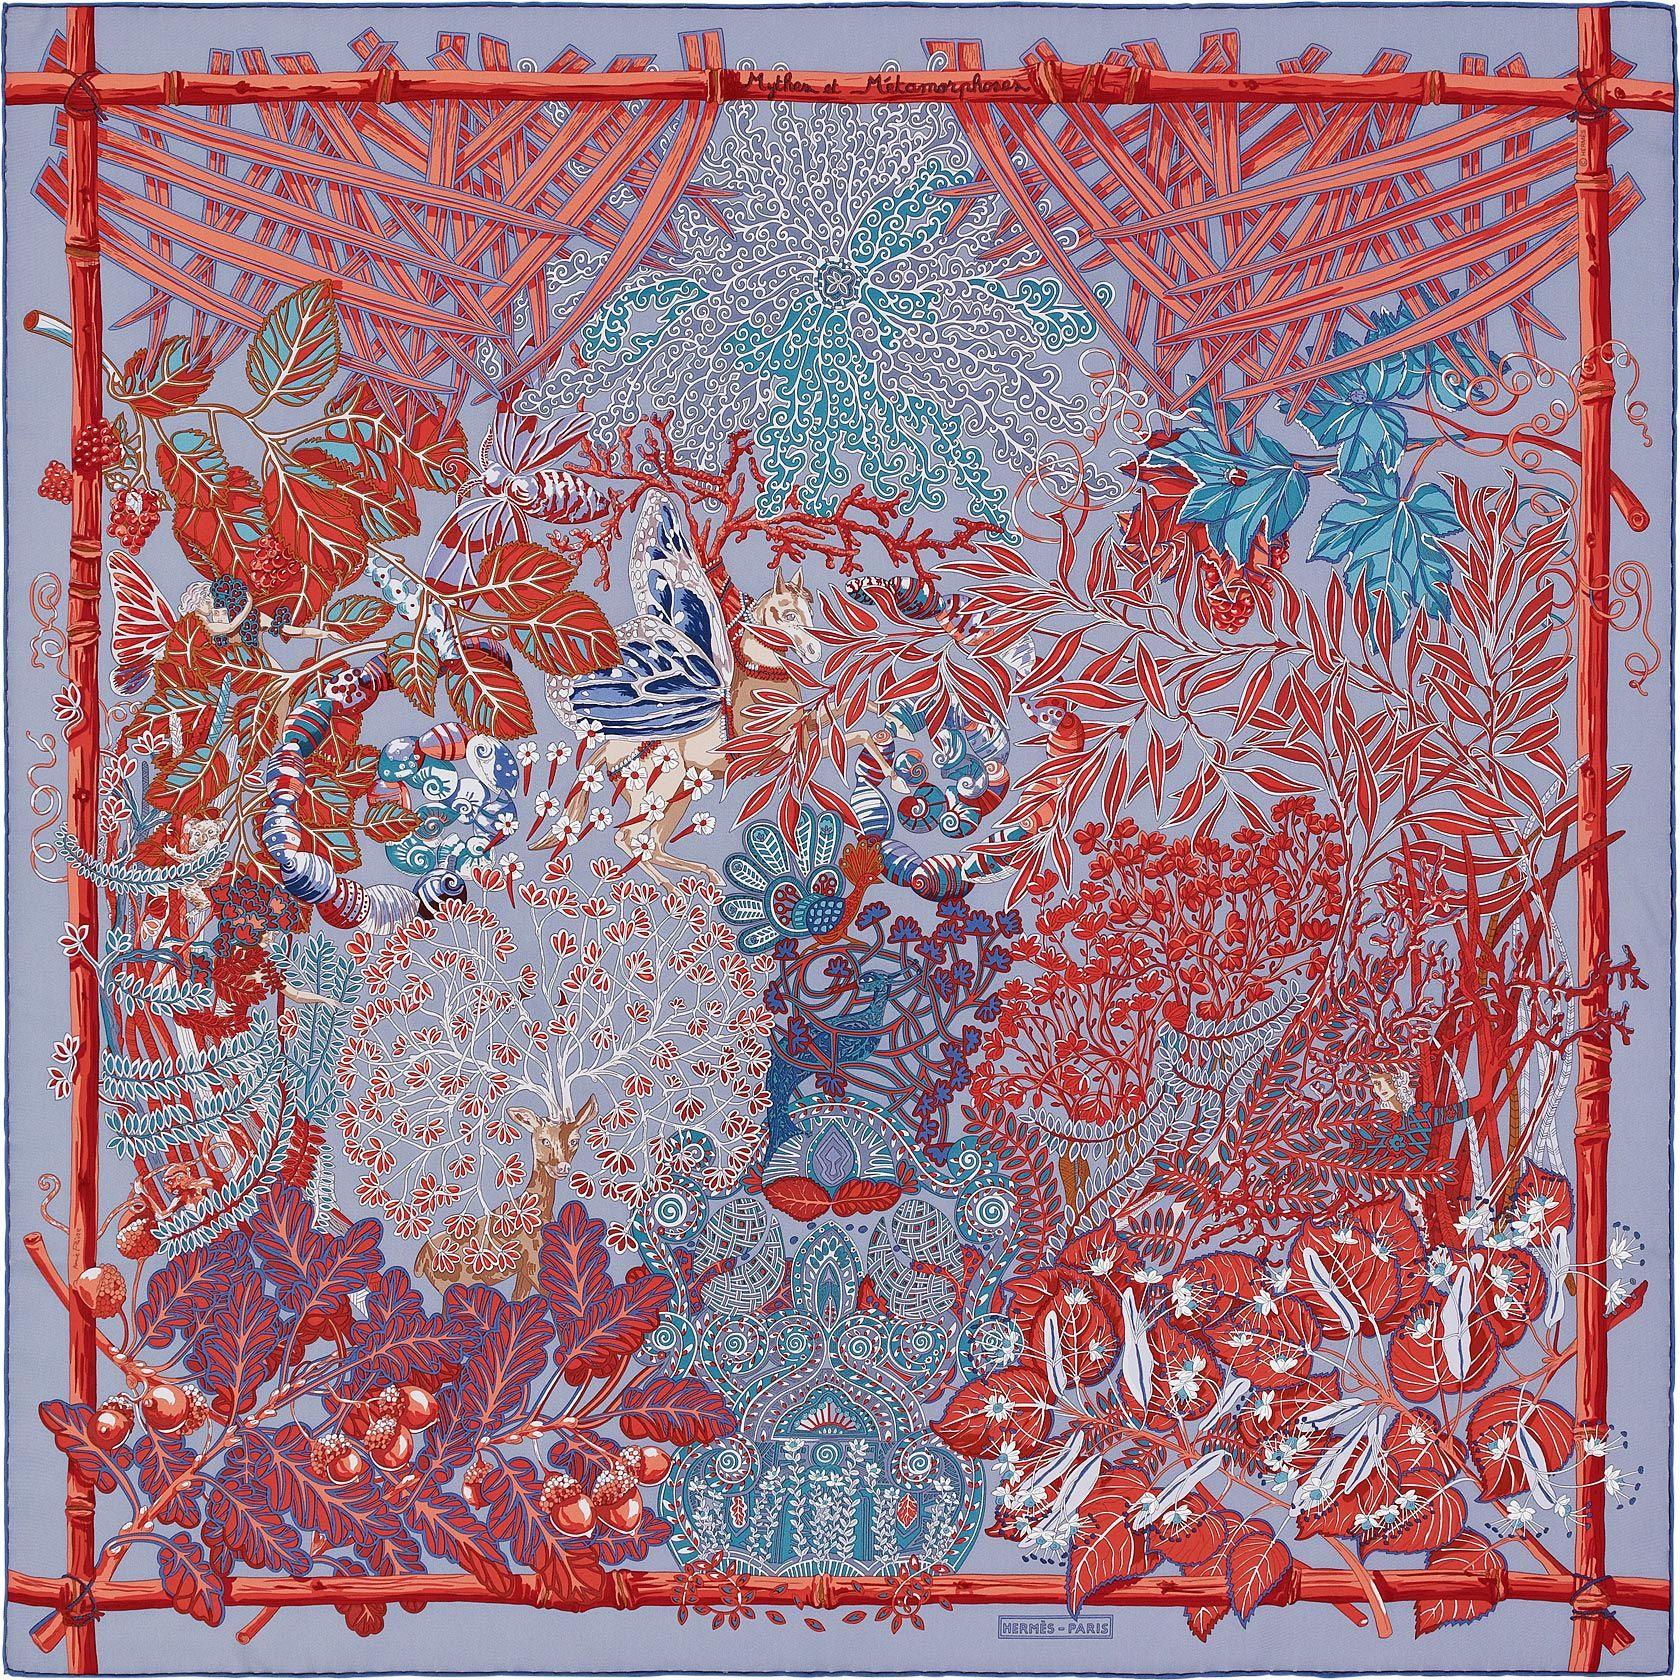 Hermès - Fleurs et Papillons de Tissus by Christine Henry - Gavroche en  twill de soie (45 x 45 cm)   Hermes   Hermes, Silk scarves, Silk adbabedf9d9